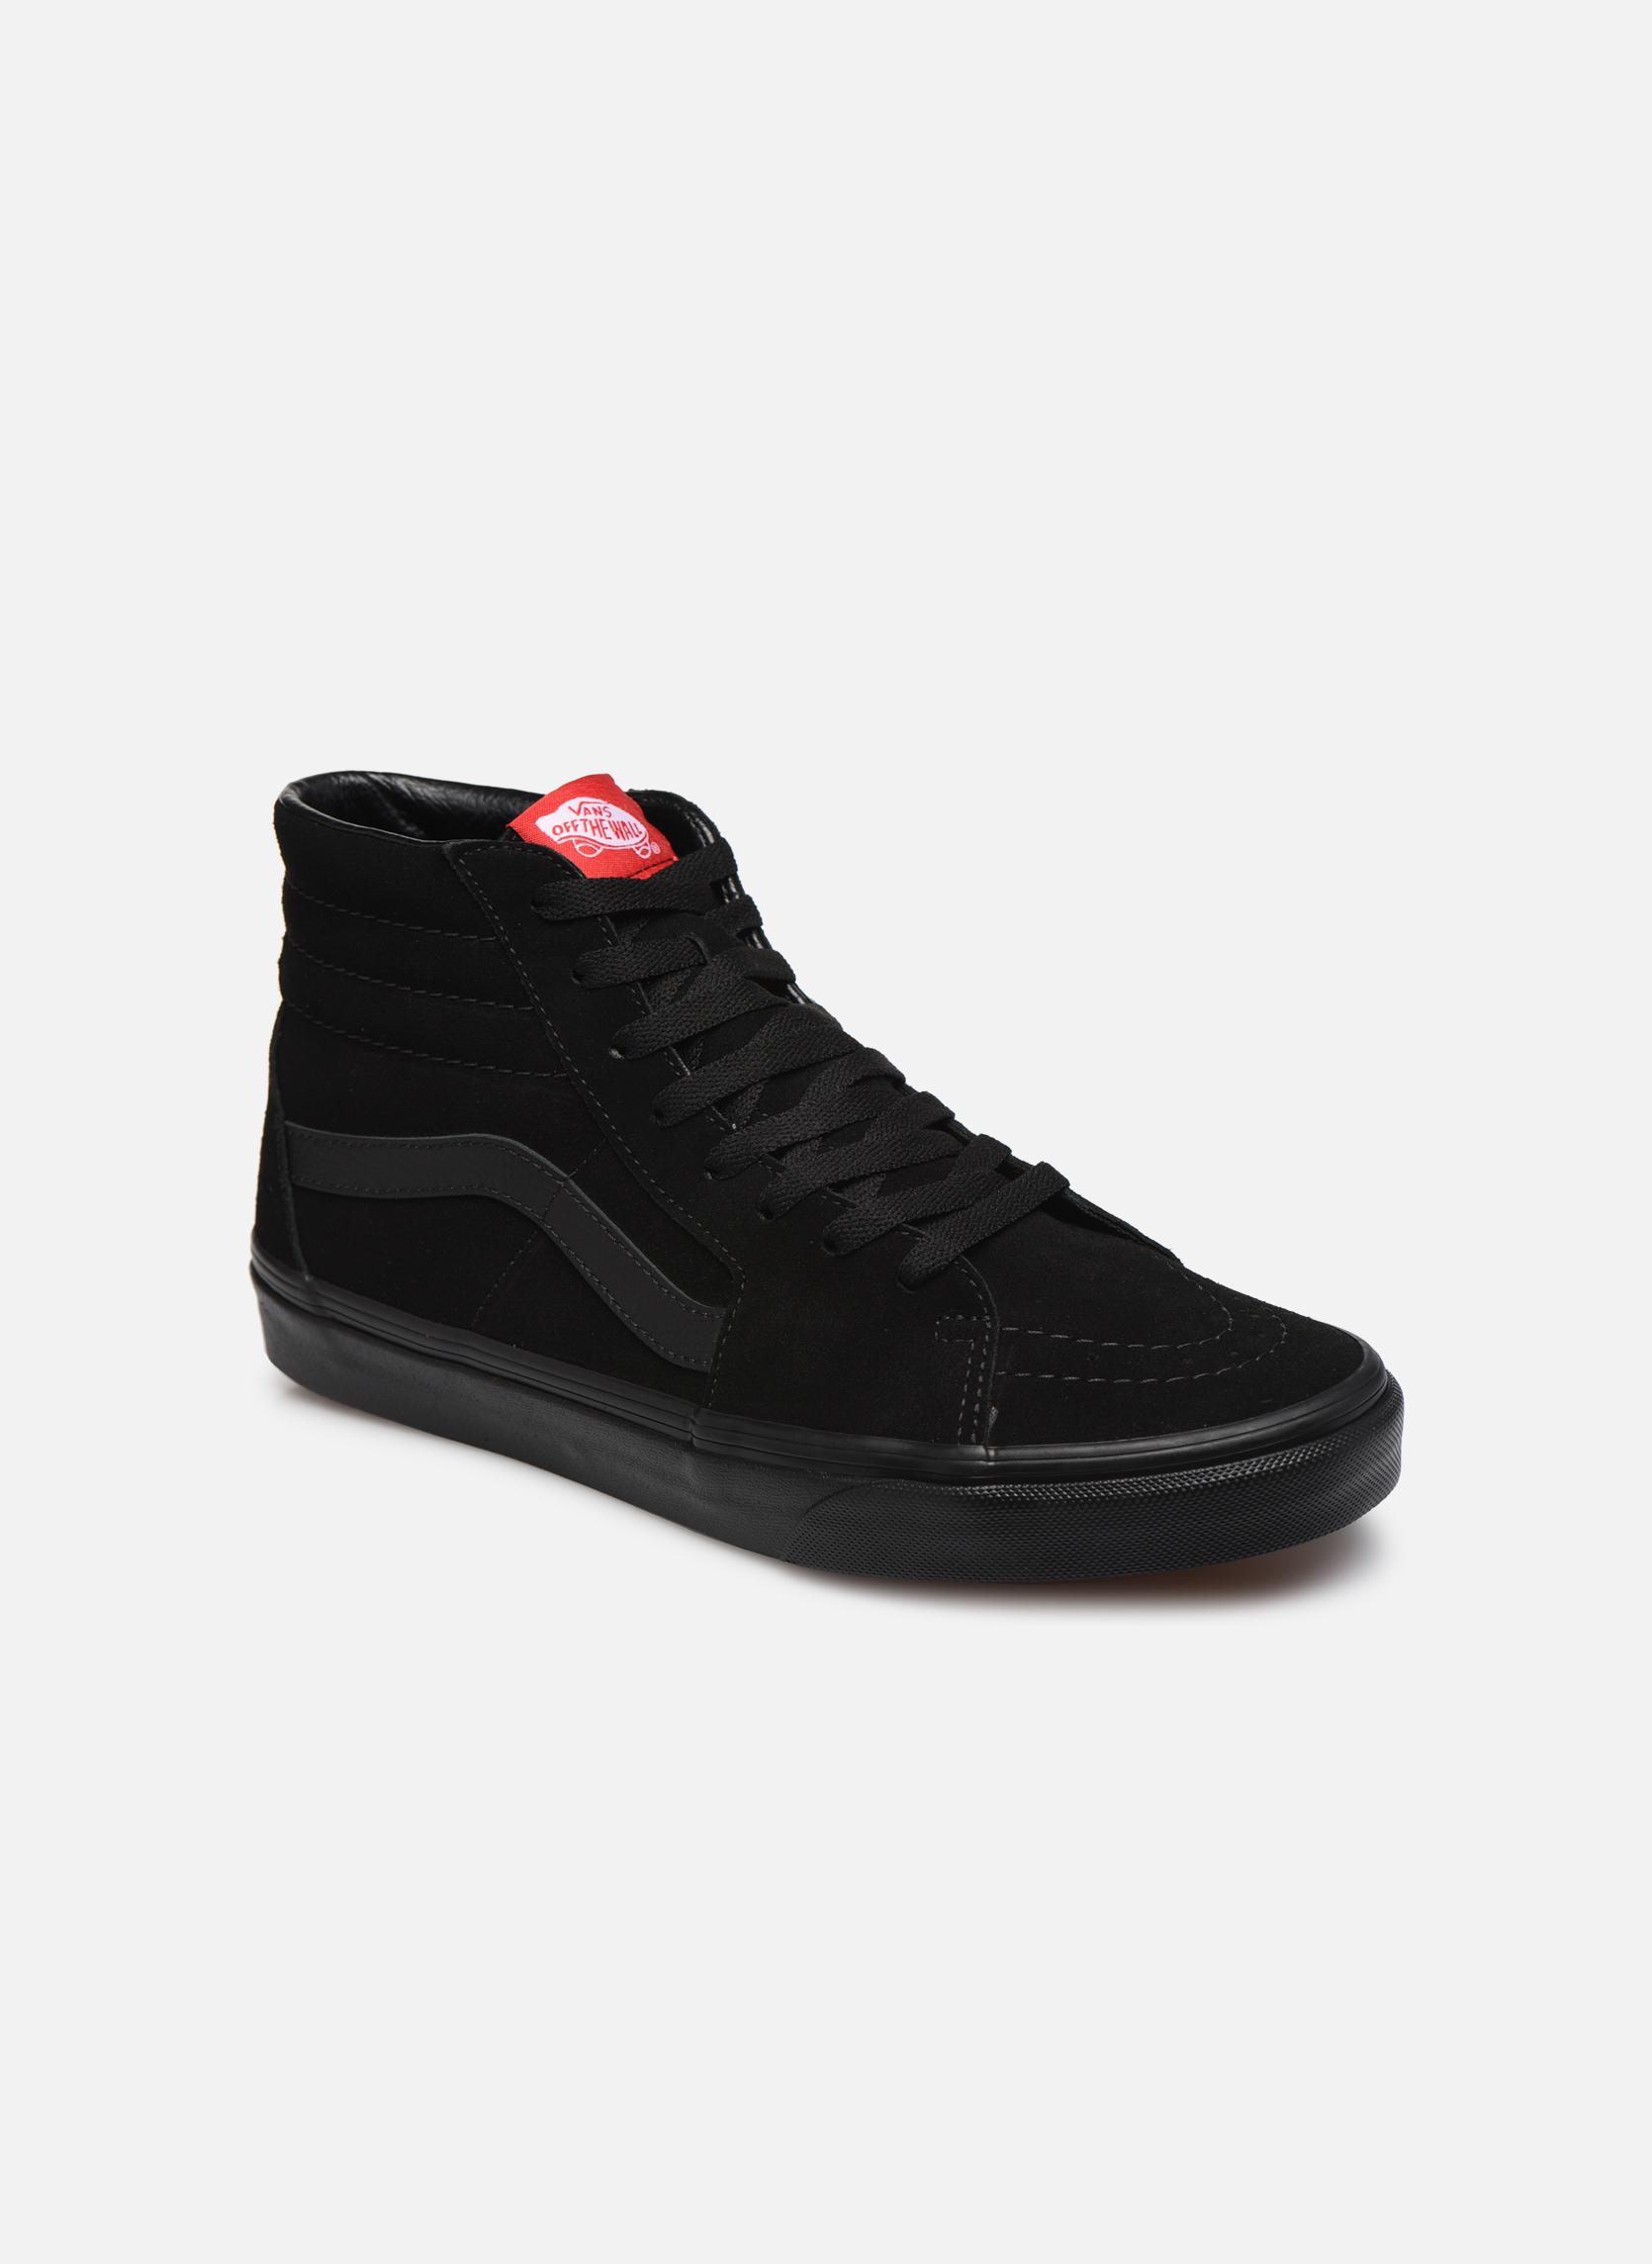 Black/black/black